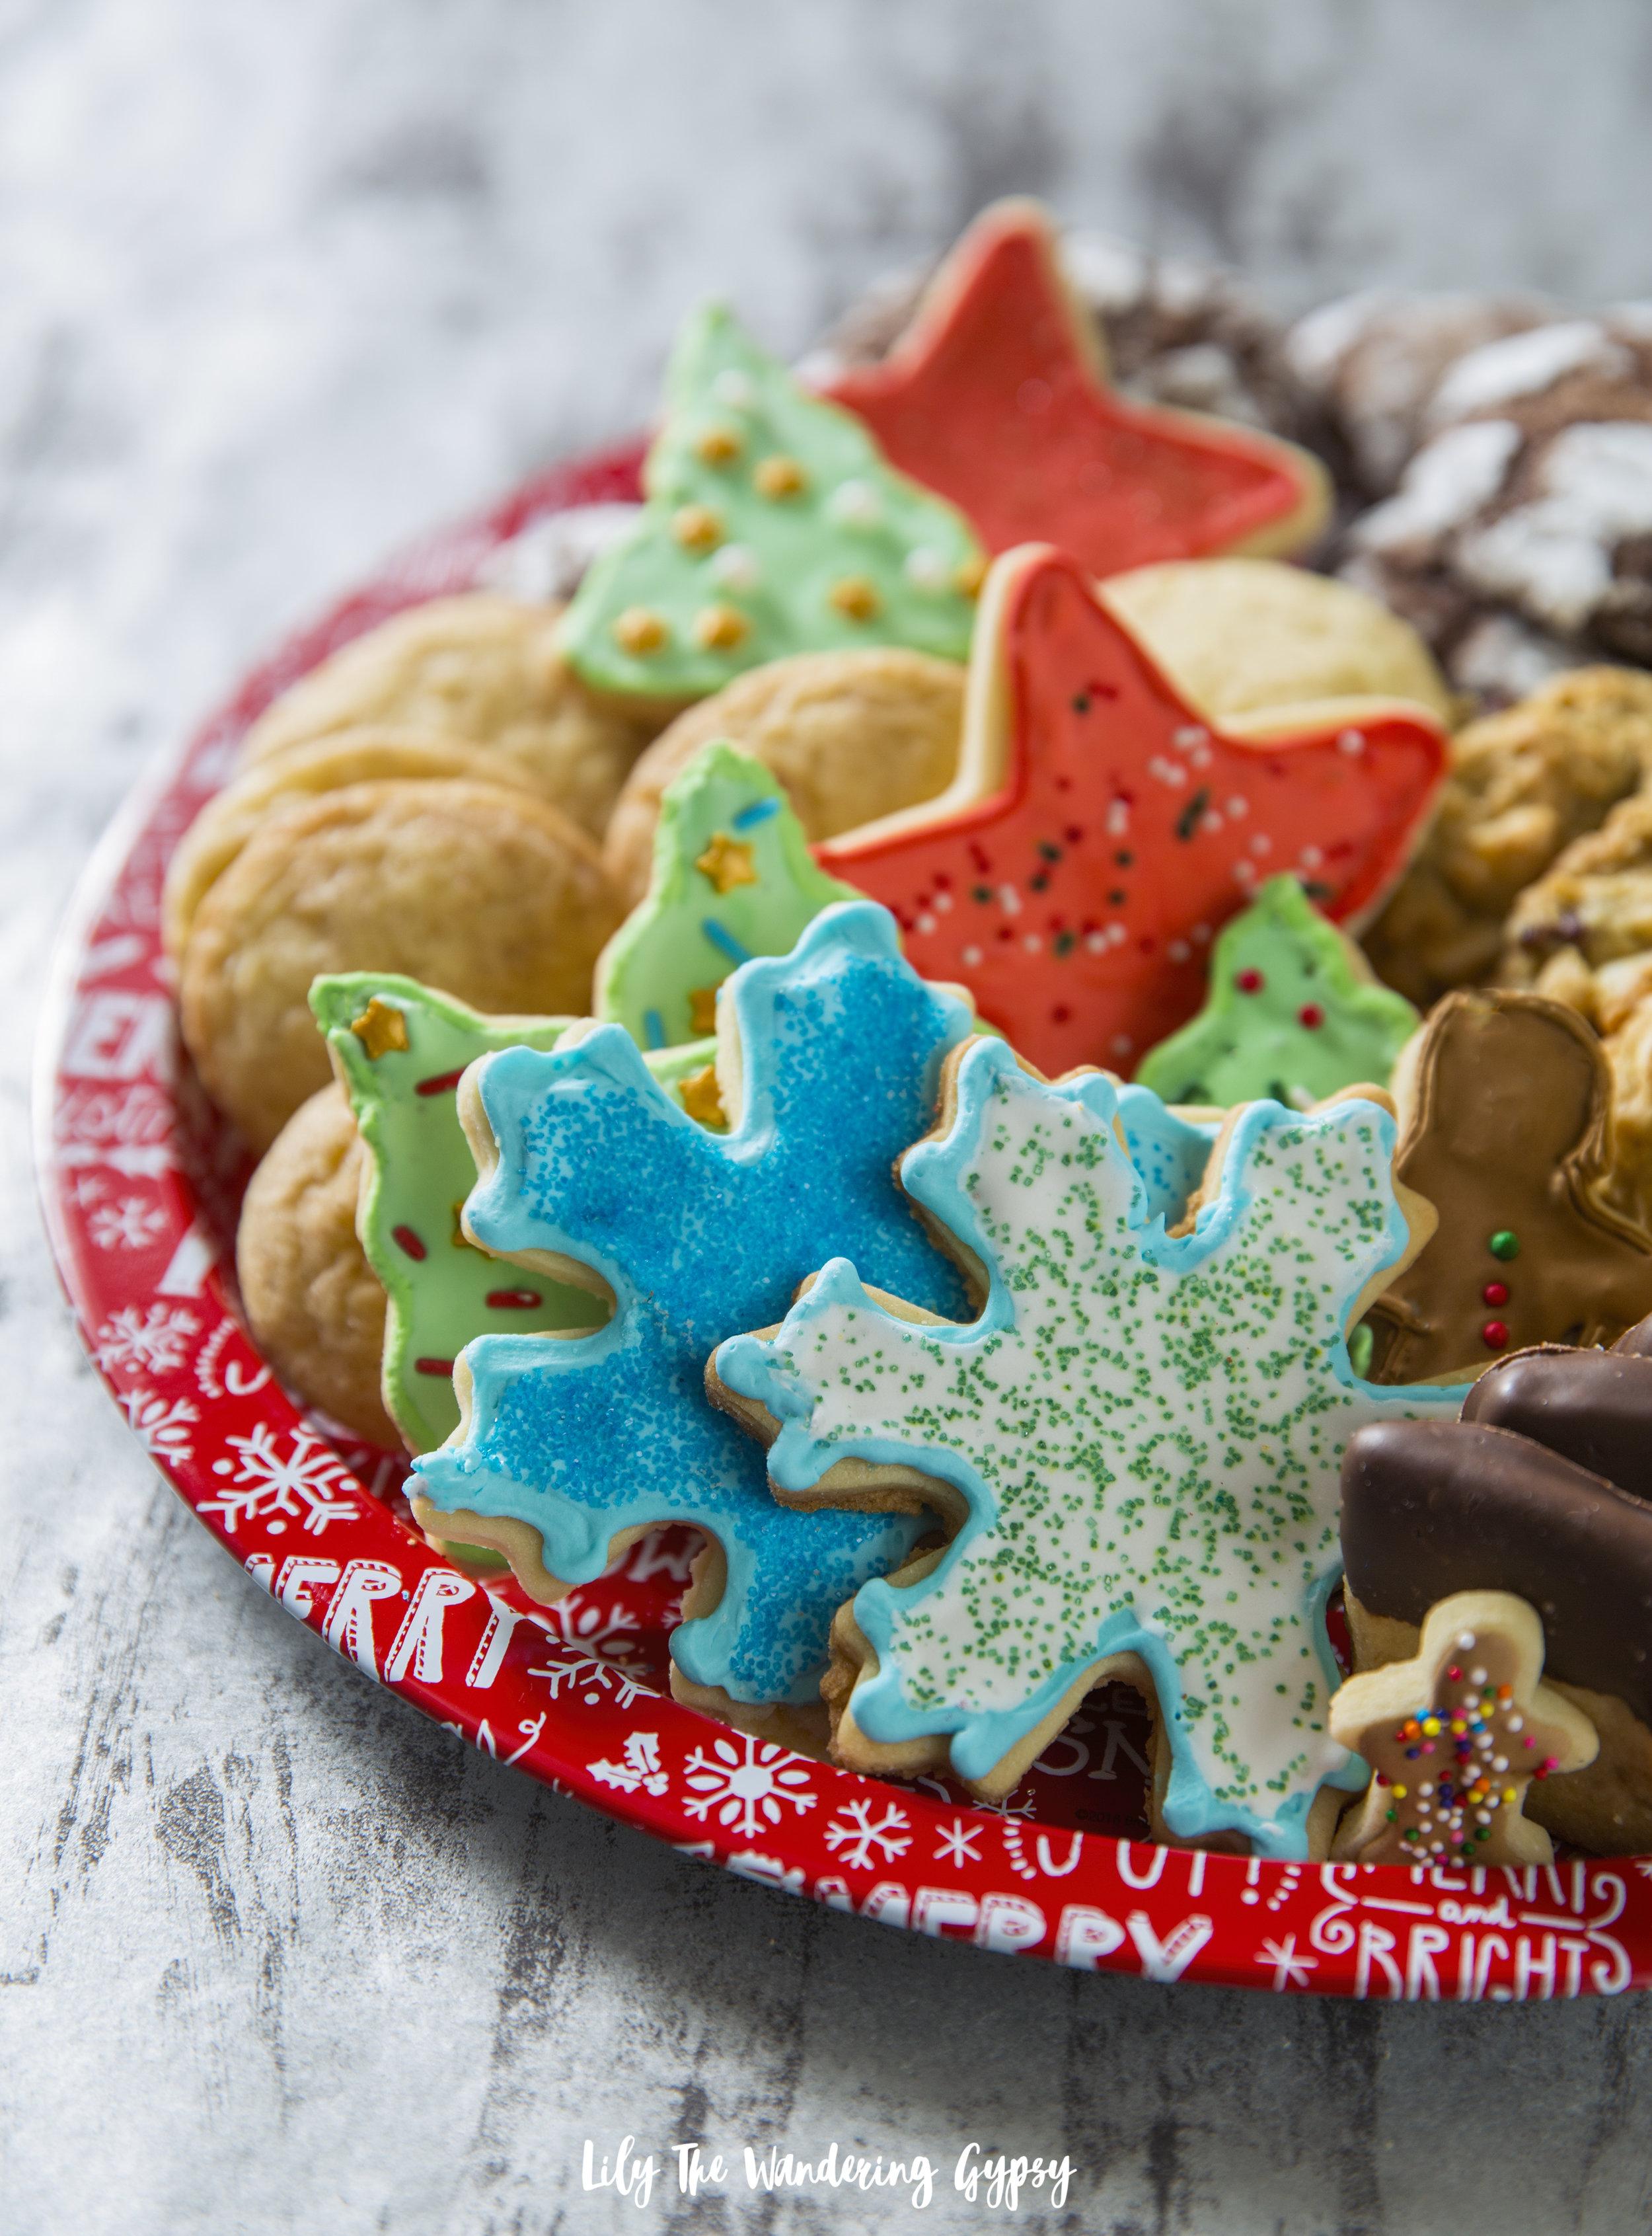 Perfect Cutout Sugar Cookies - Iced